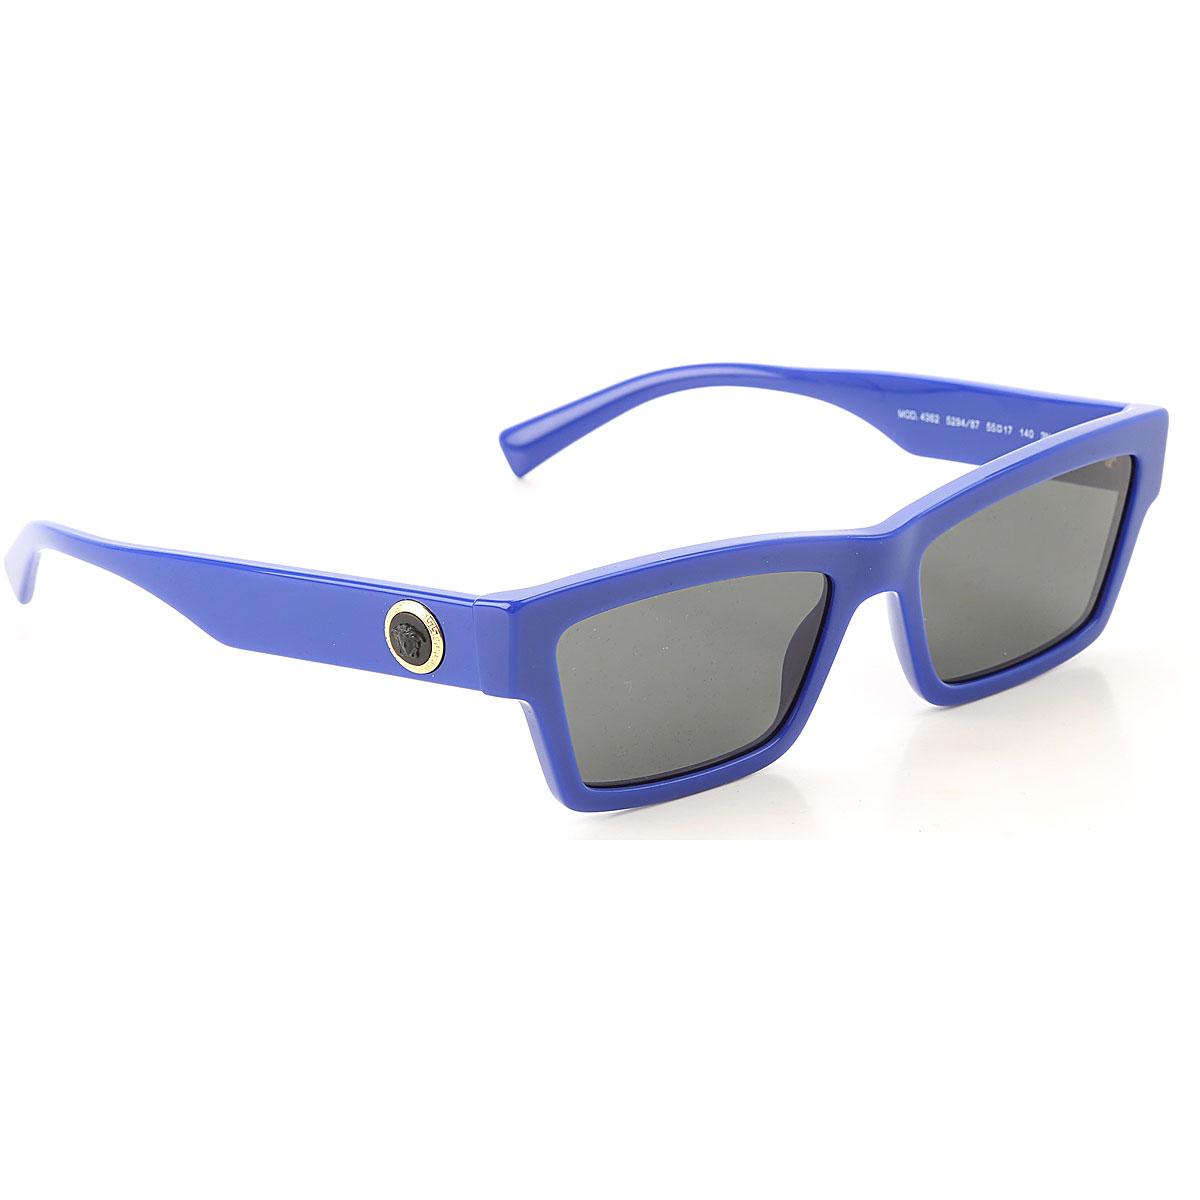 Gianni Versace Sunglasses On Sale, Electric Blue, 2019